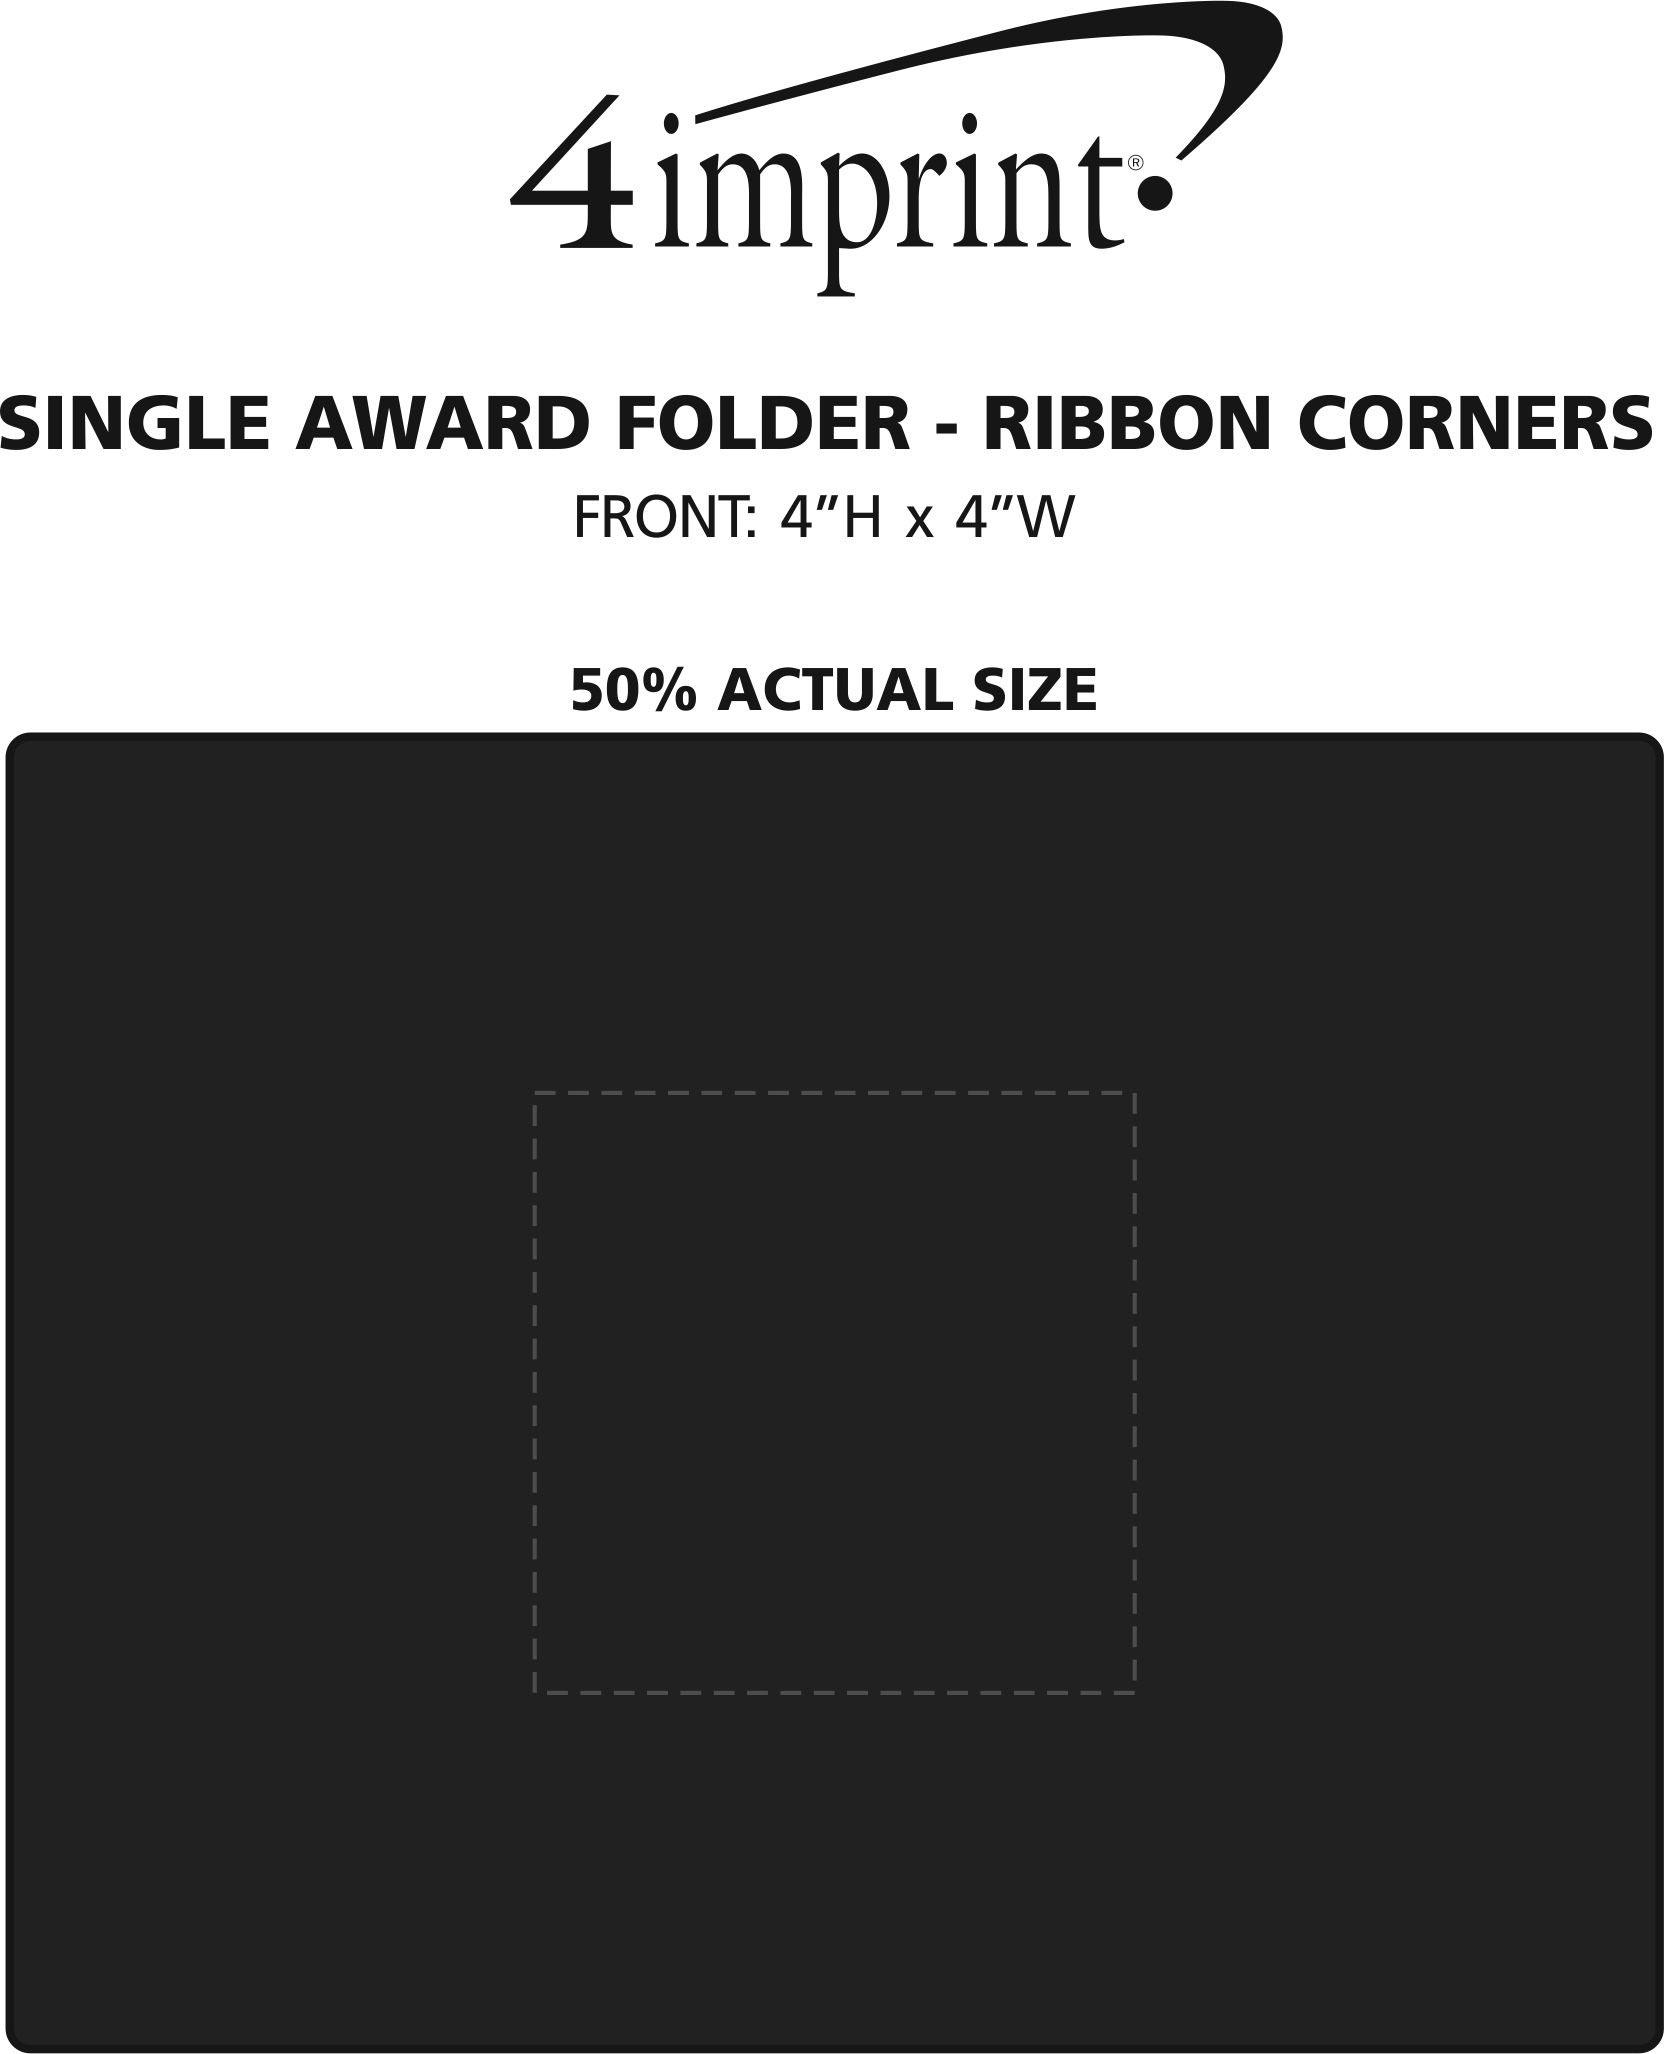 Imprint Area of Single Award Folder - Ribbon Corners